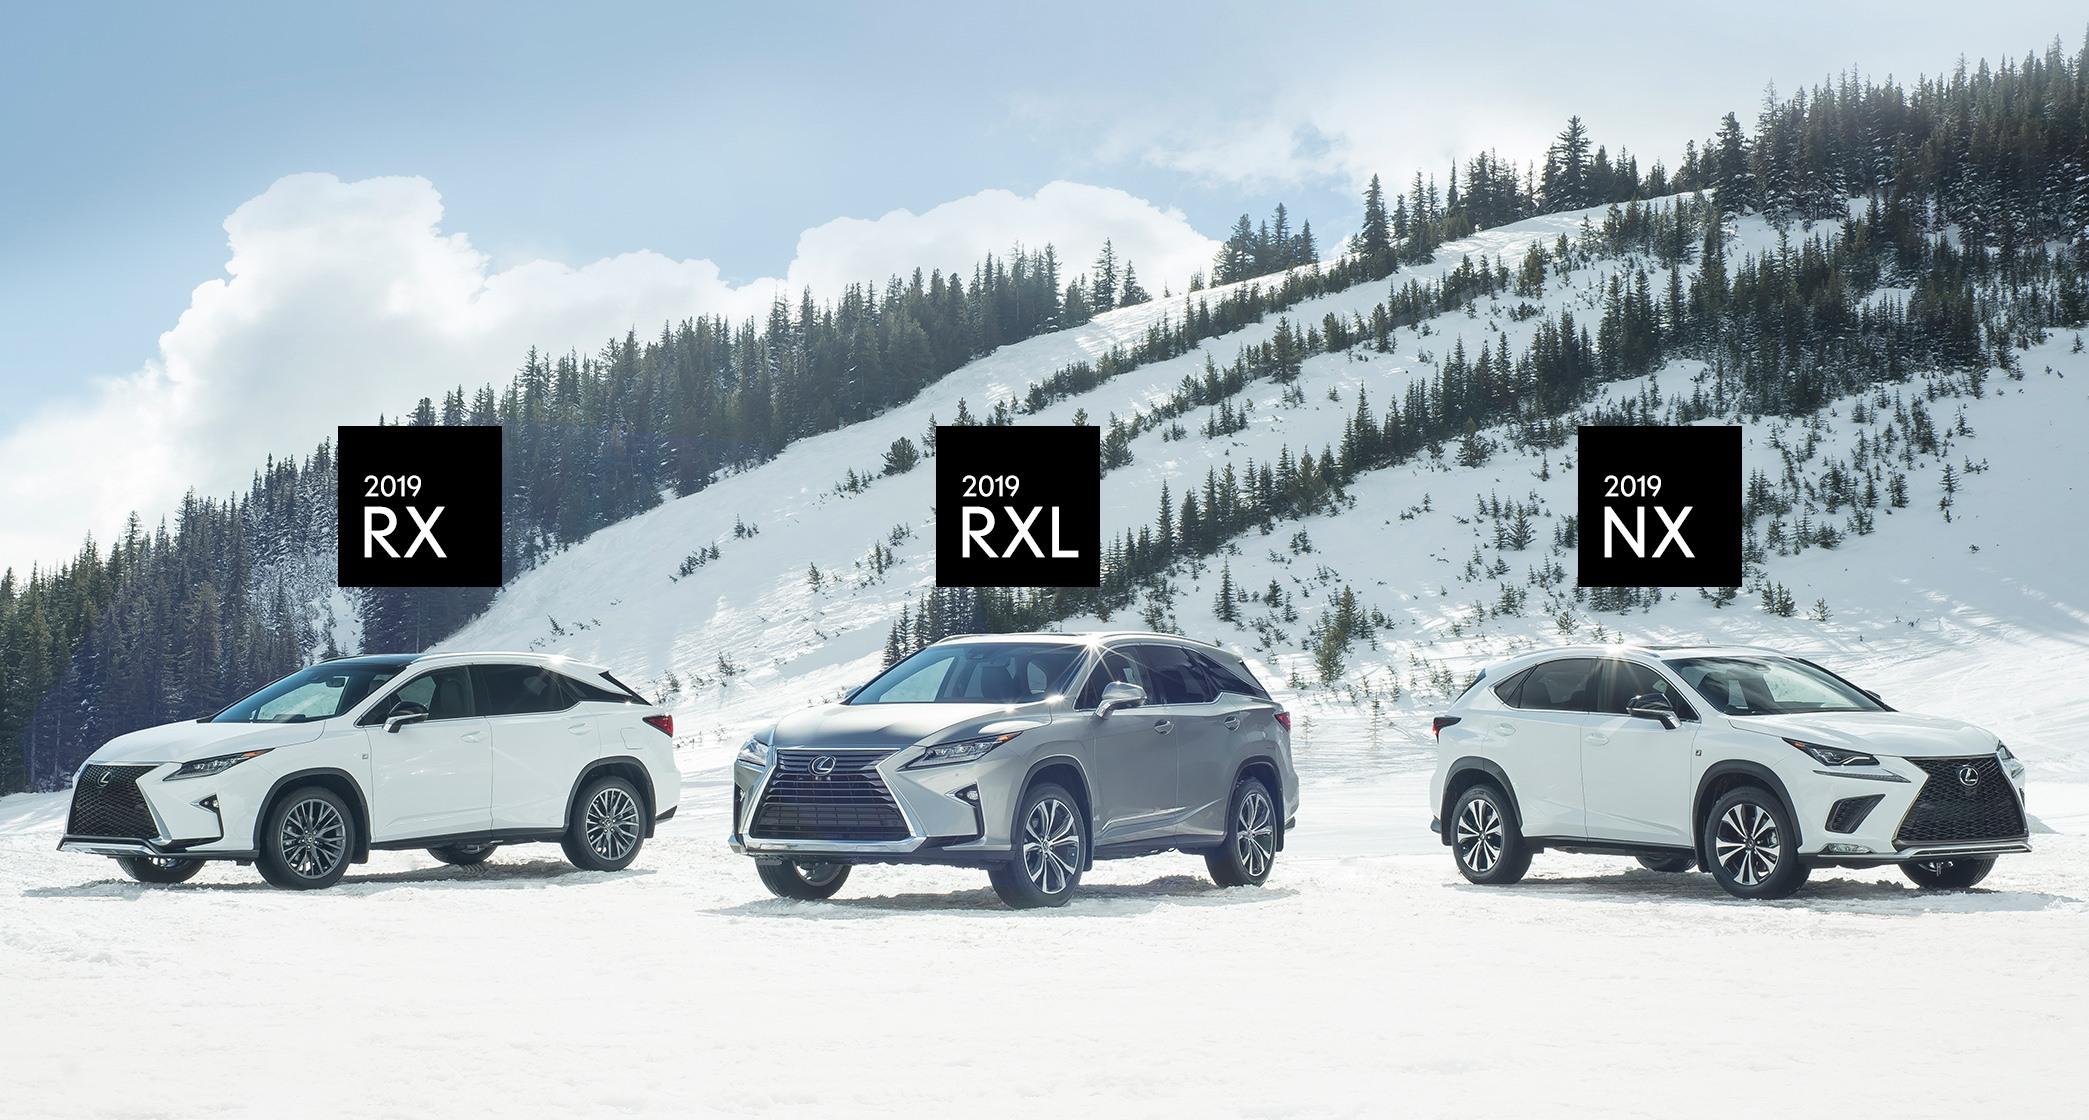 Lexus of Lakeridge Lexus RX Lexus RXL Lexus NX